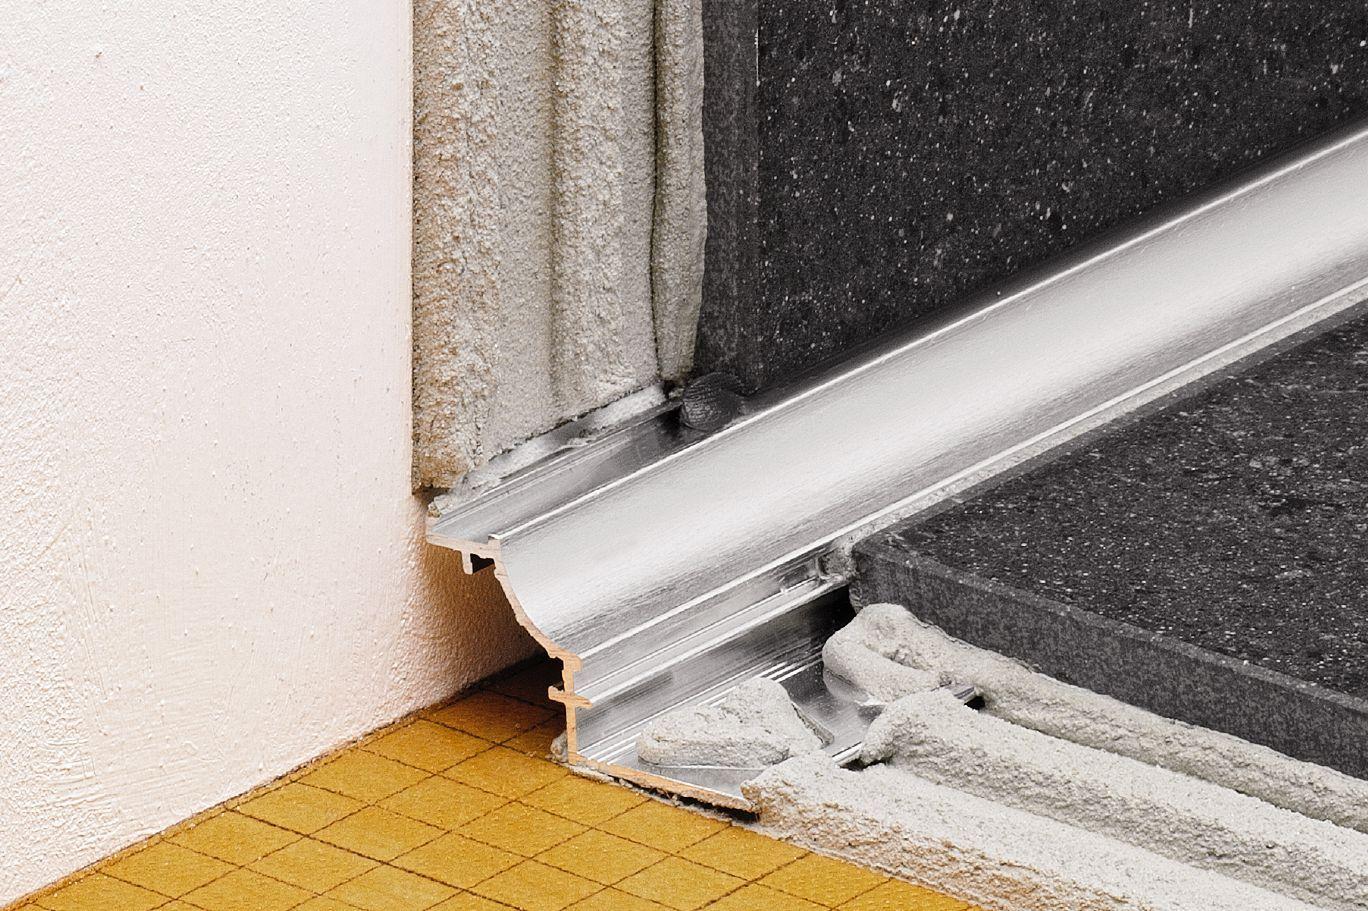 - DILEX-AHK Countertop Backsplash, Schluter Tile Edge, Beautiful